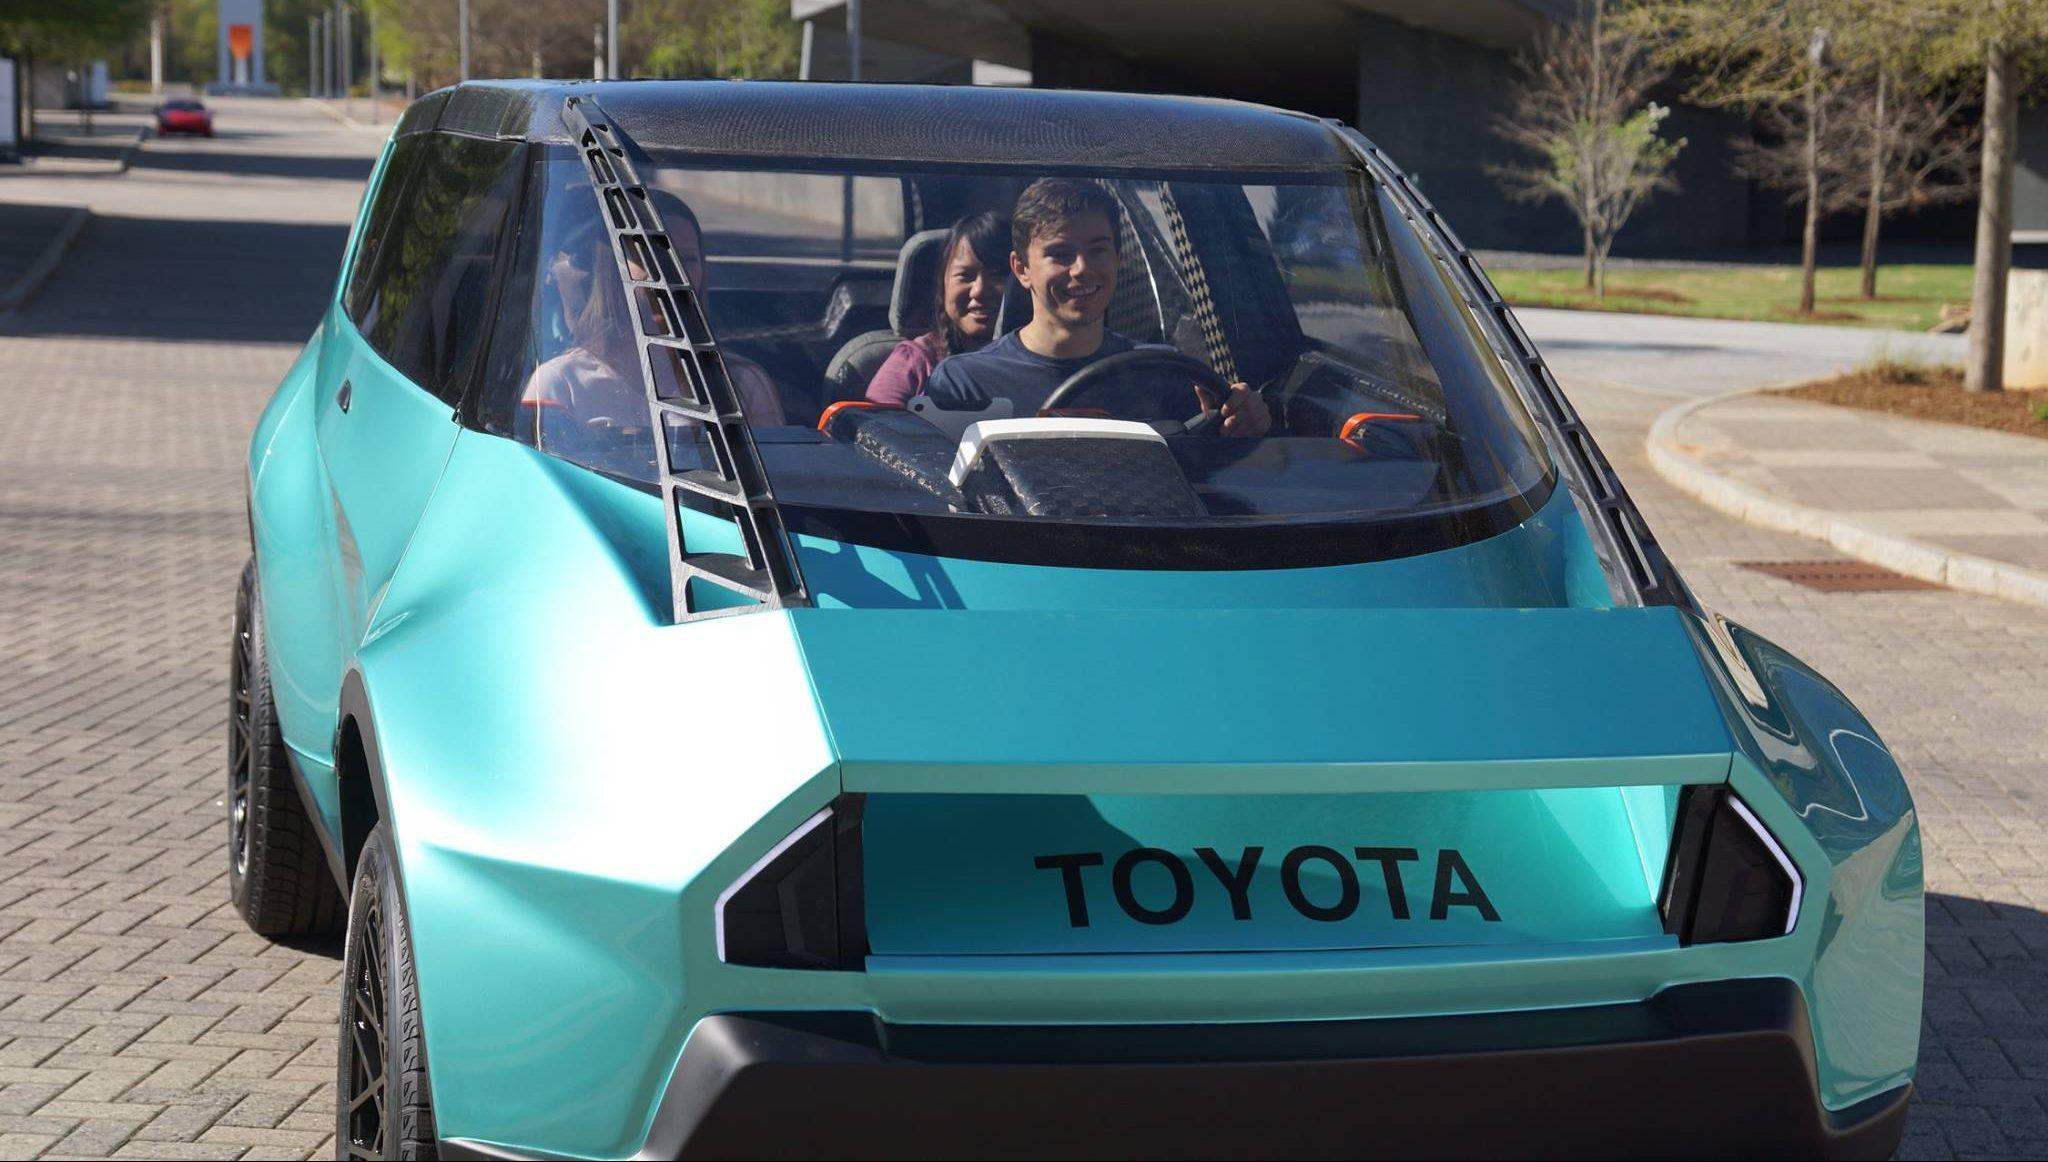 Quando pneumatico diventa un ossimoro - image Toyota-uBox-TeXtreme-01 on https://motori.net